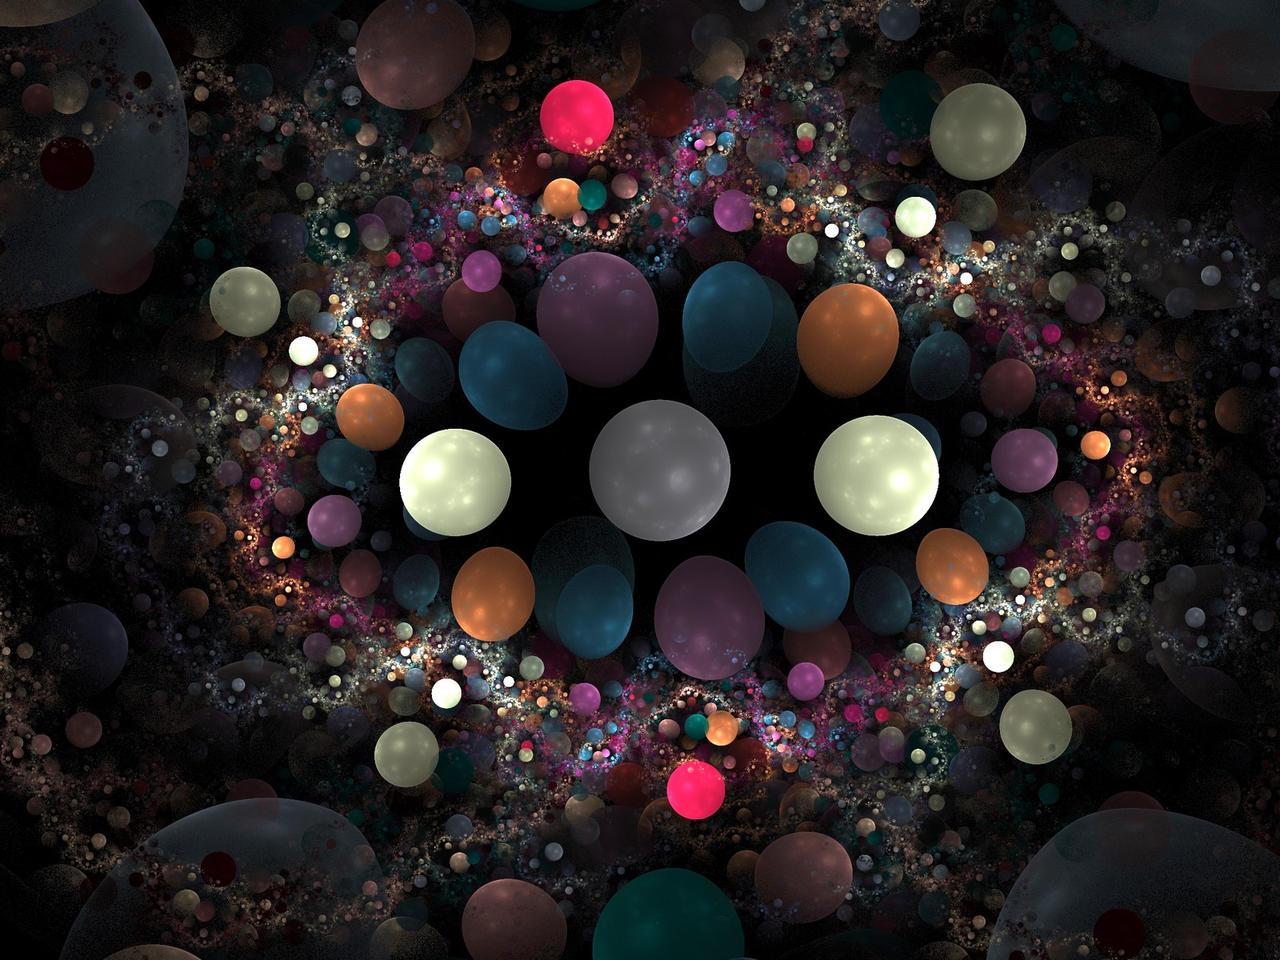 Mr bubble by TheLionofOZ